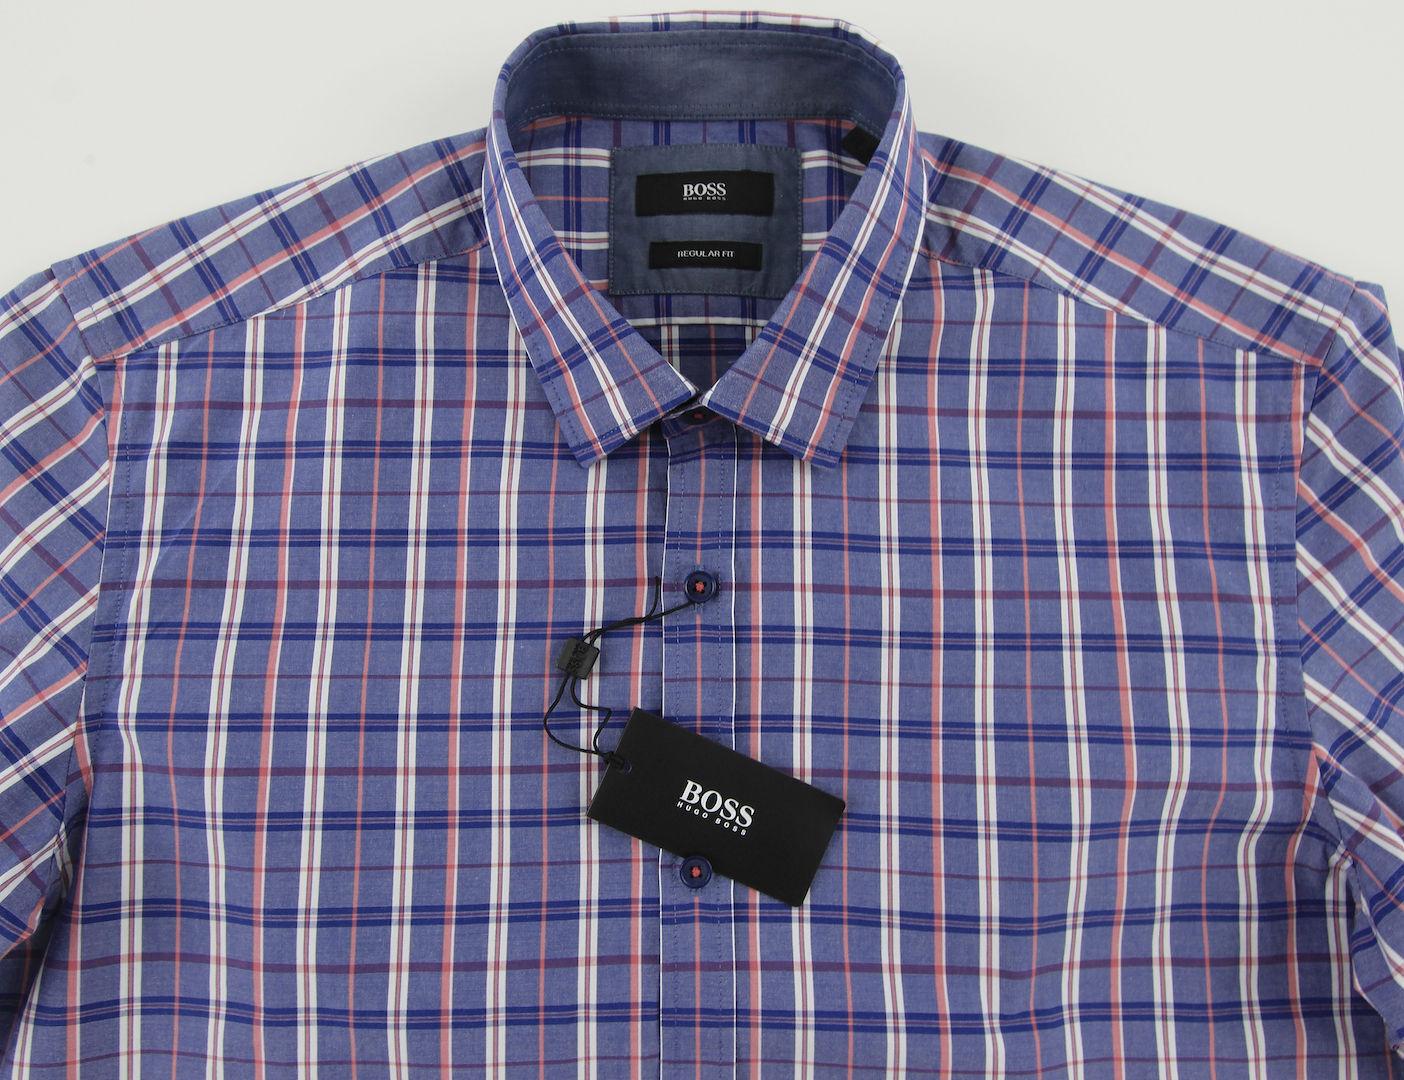 Men's HUGO BOSS Periwinkle bluee Plaid LOK Shirt XL Extra Large NWT NEW +